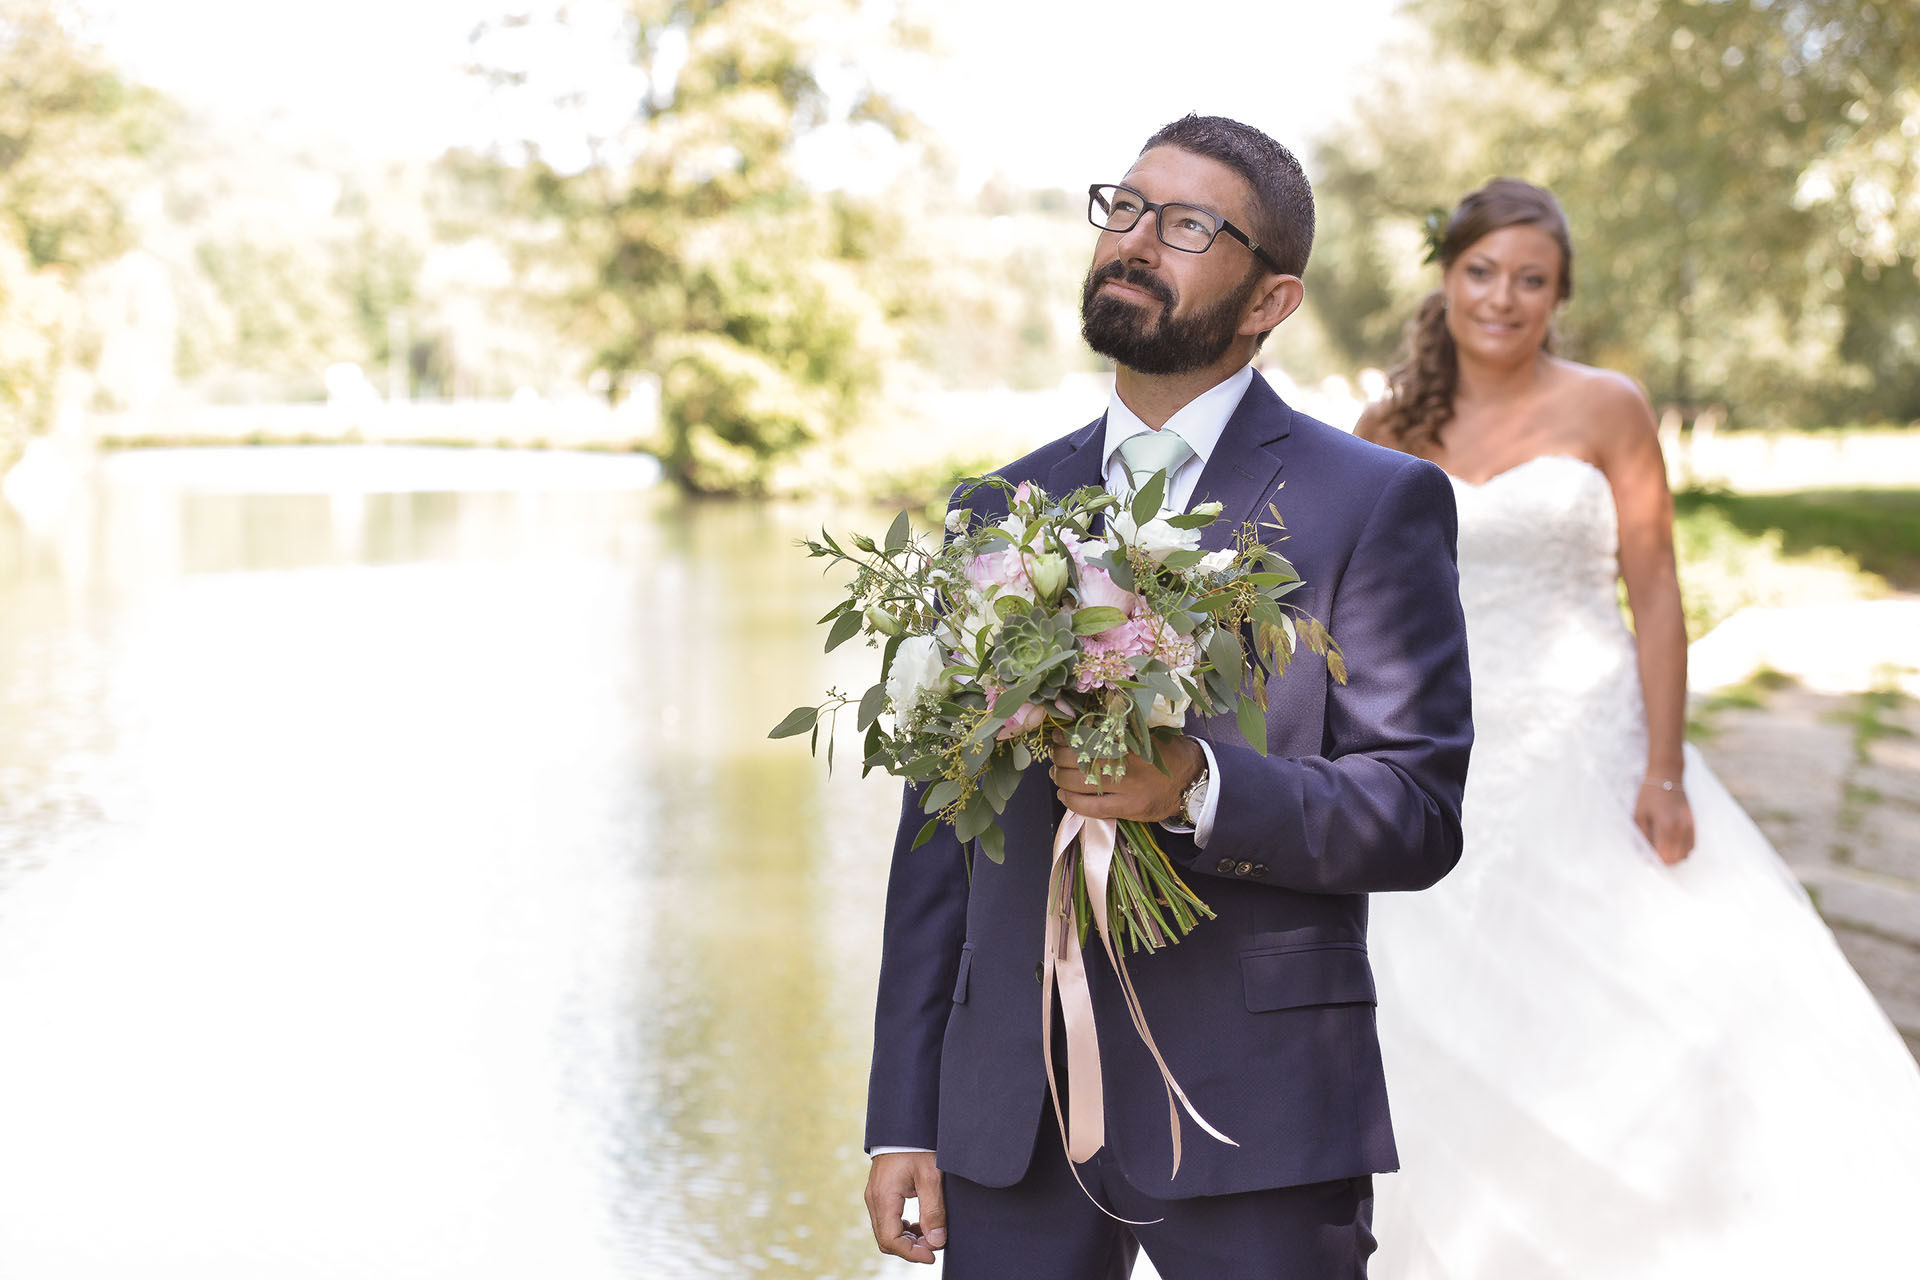 photographe-ile-de-france-mariage-maya-angelsen-fanny-pierre-gabriel-yvelines